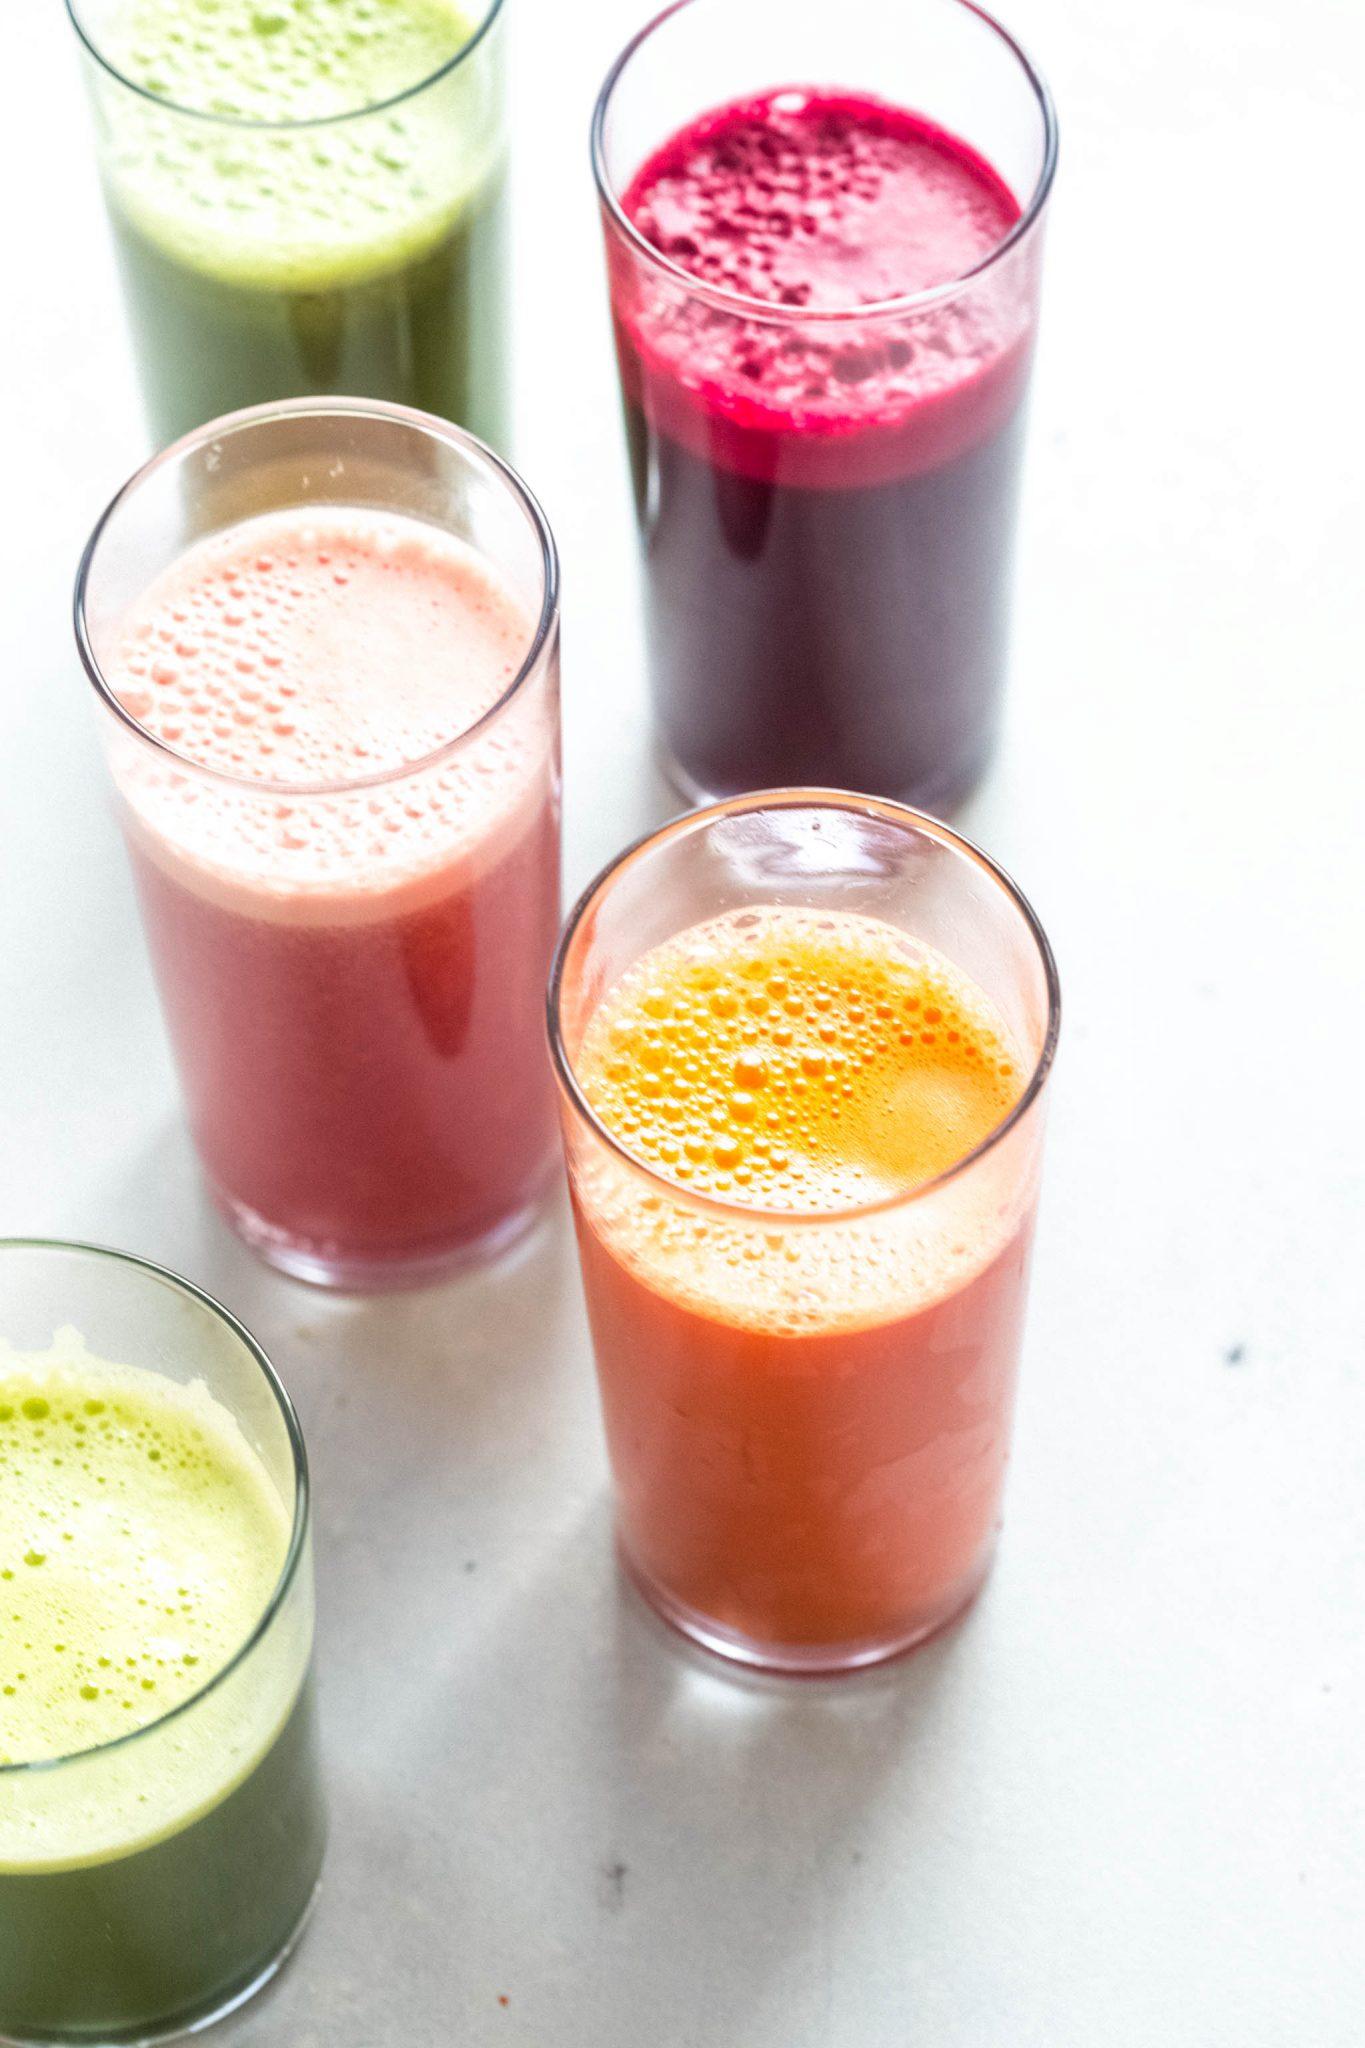 Sfecla rosie | Juice cleanse recipes, Detox juice, Red juice recipe